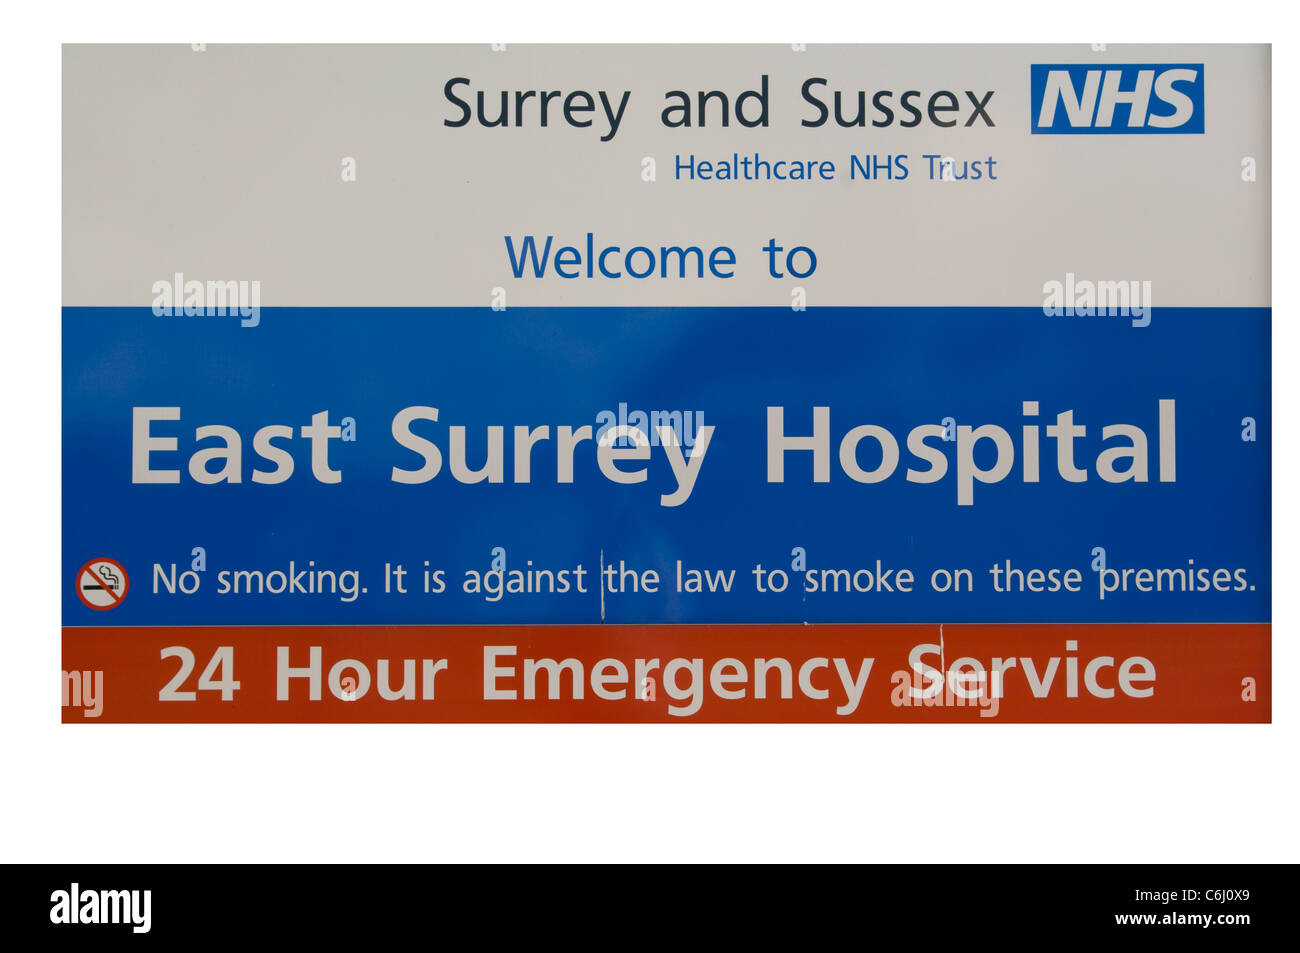 Osten Surrey NHS National Health Service Hospital Stockbild